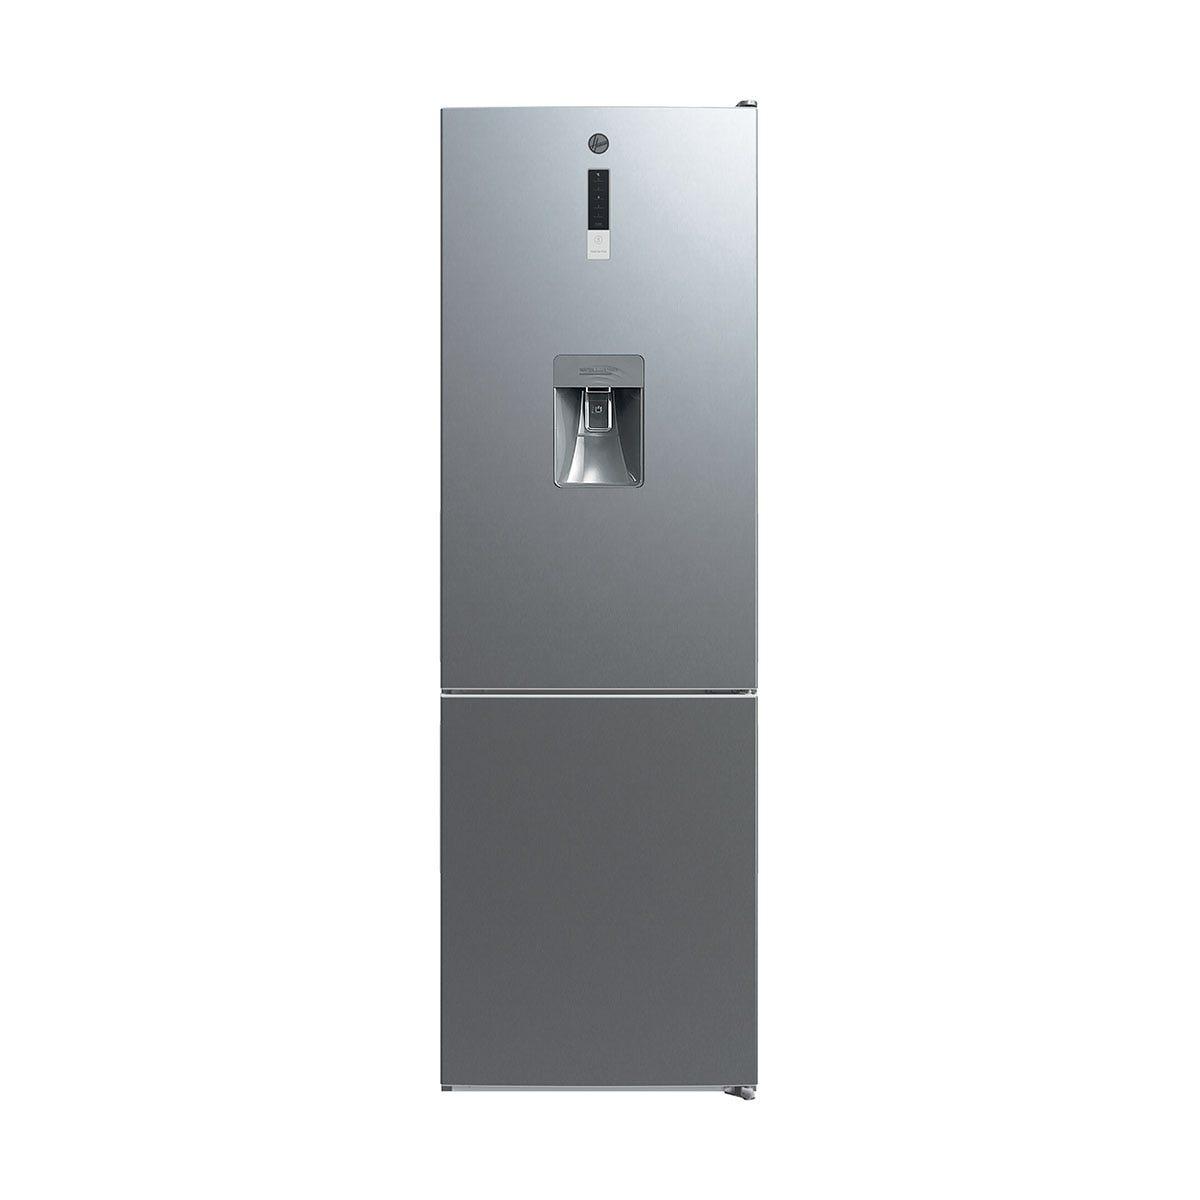 Hoover HMDNV 6184XWDK 300L 60cm Total No Frost Fridge Freezer - Stainless Steel